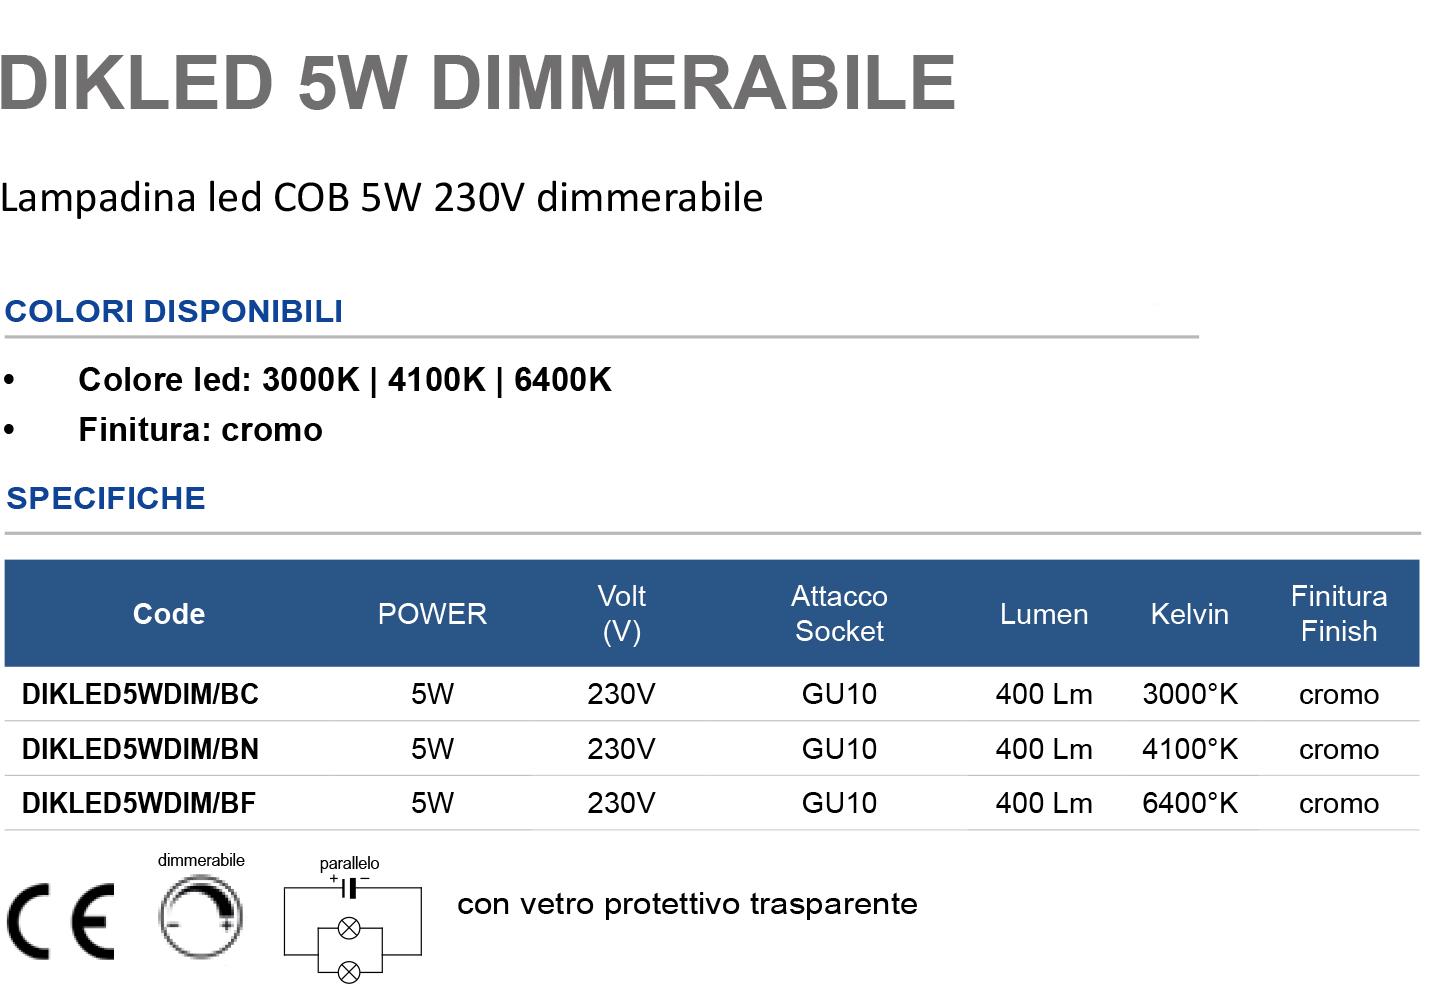 Lampadina led COB 5W 230V dimmerabile